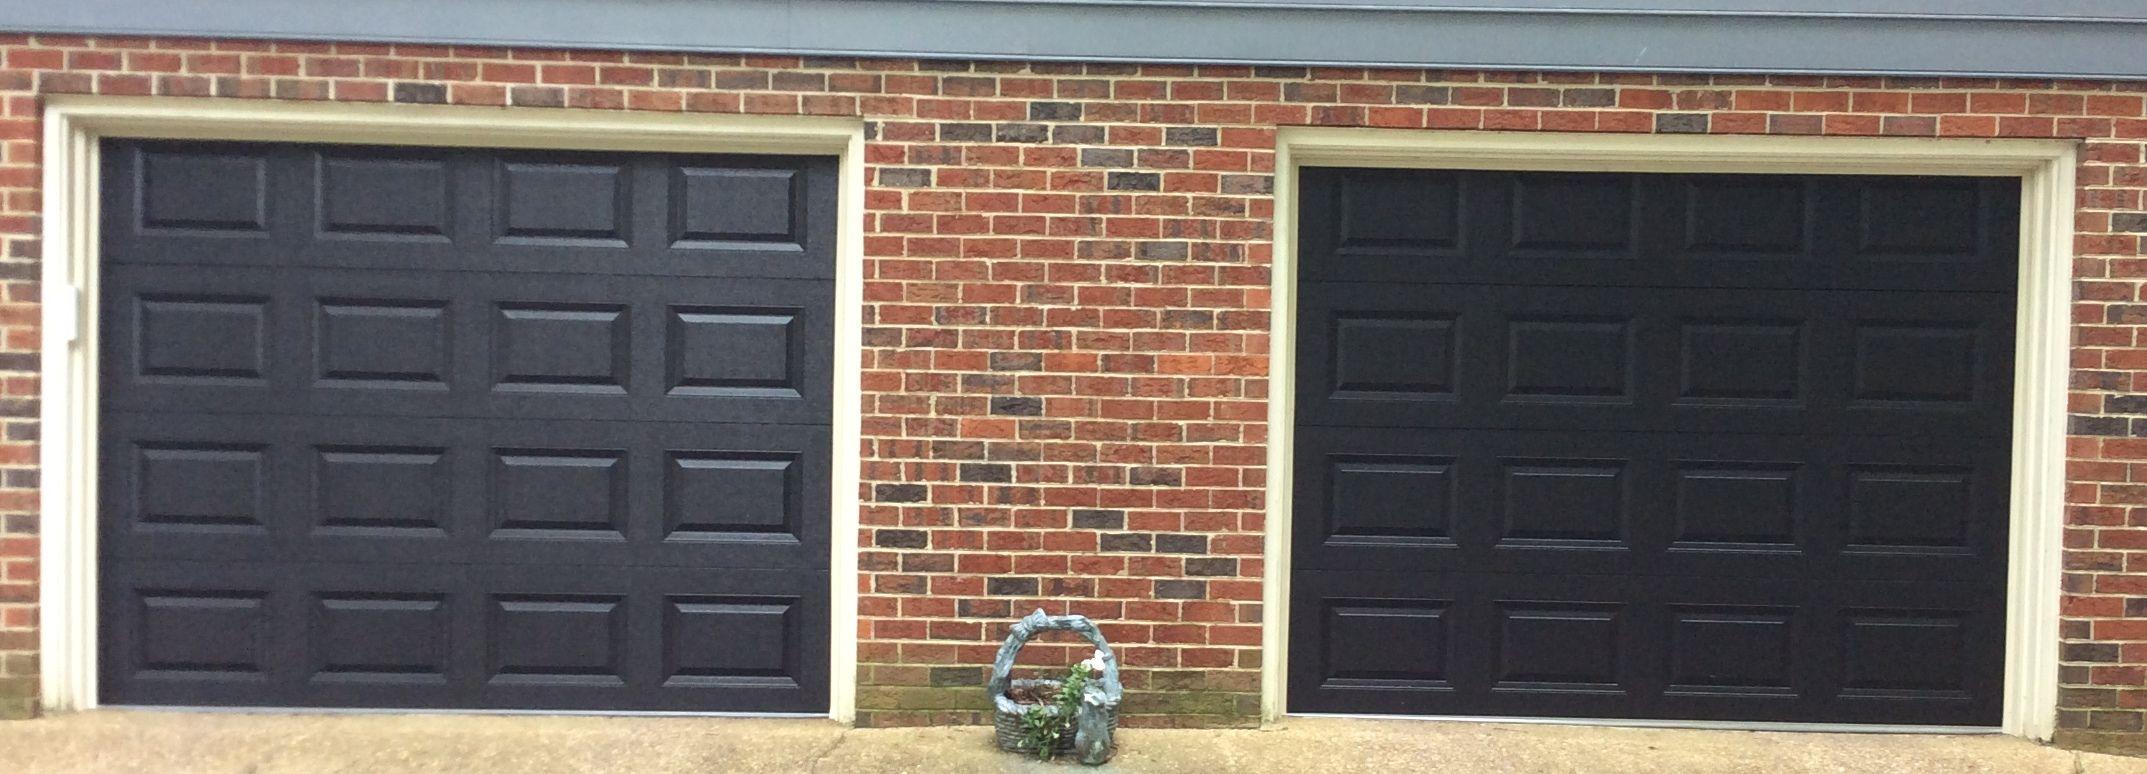 Two 9x7 Model 2216 Black Double Sided Steel Garage Doors Installed